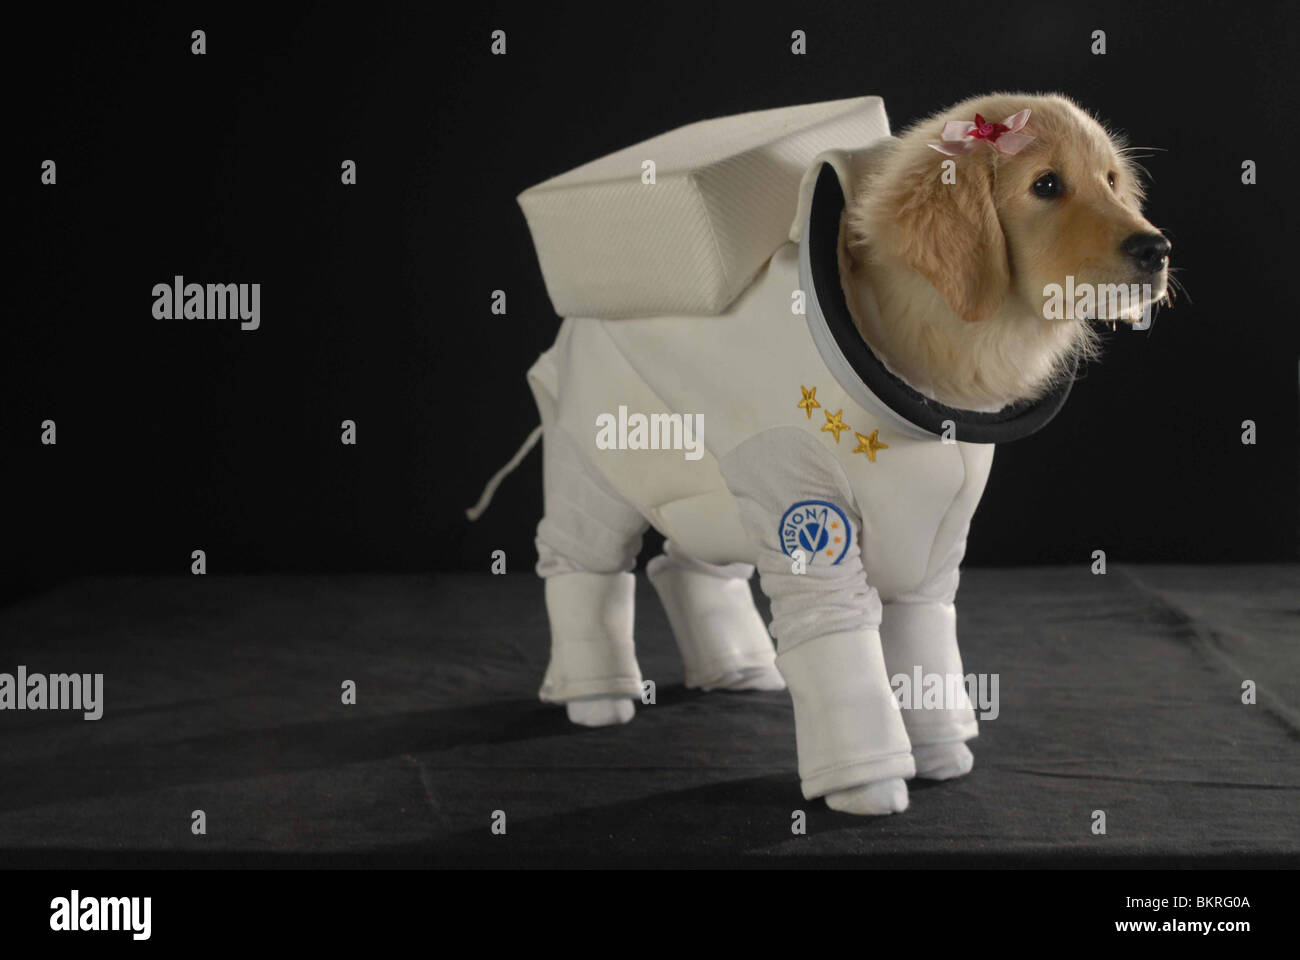 SPACE BUDDIES (2009) ROBERT VINCE (DIR) 004 - Stock Image